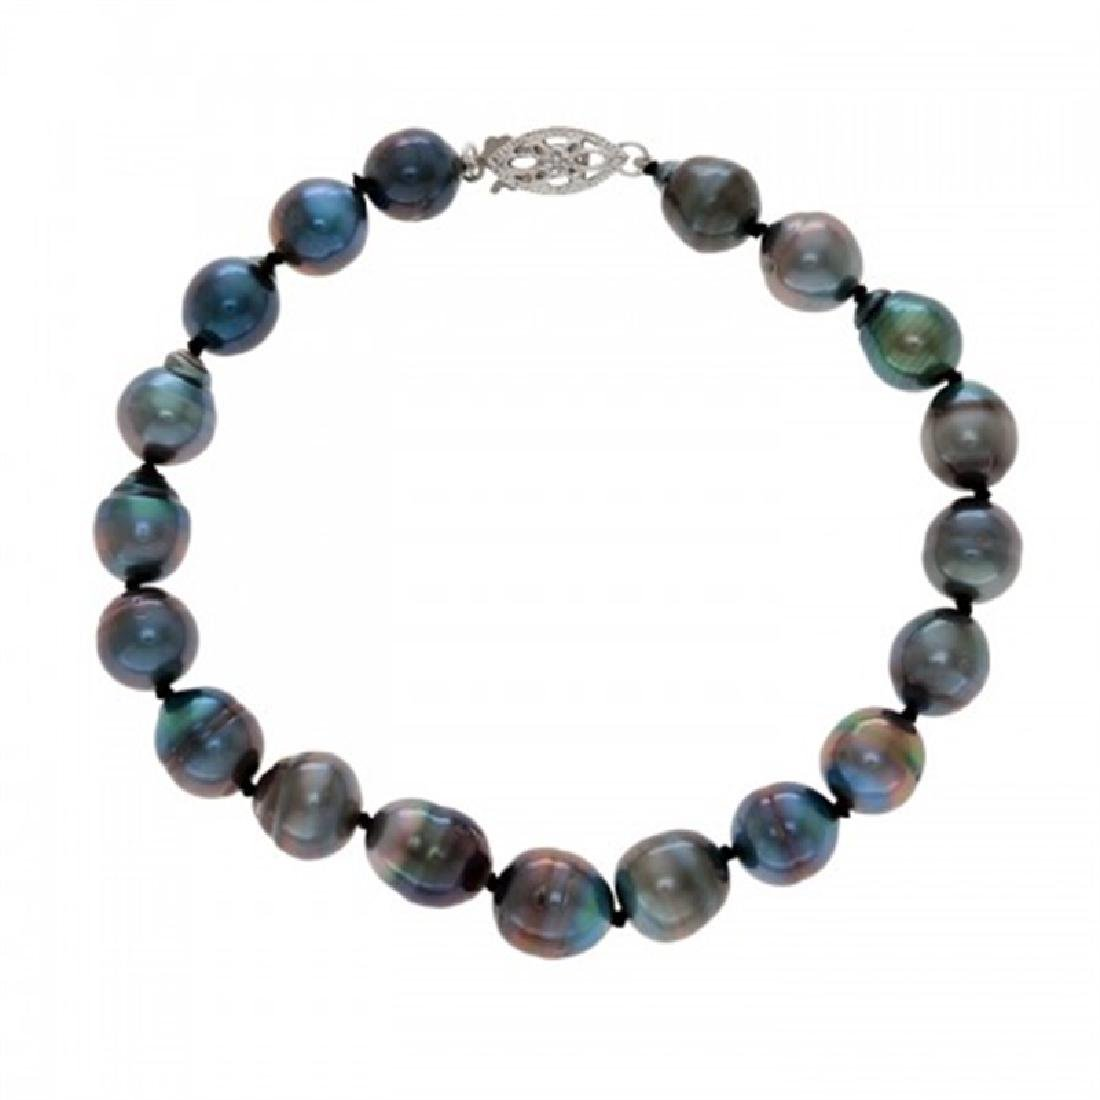 7.0-8.5mm Tahitian Black Pearl Bracelet